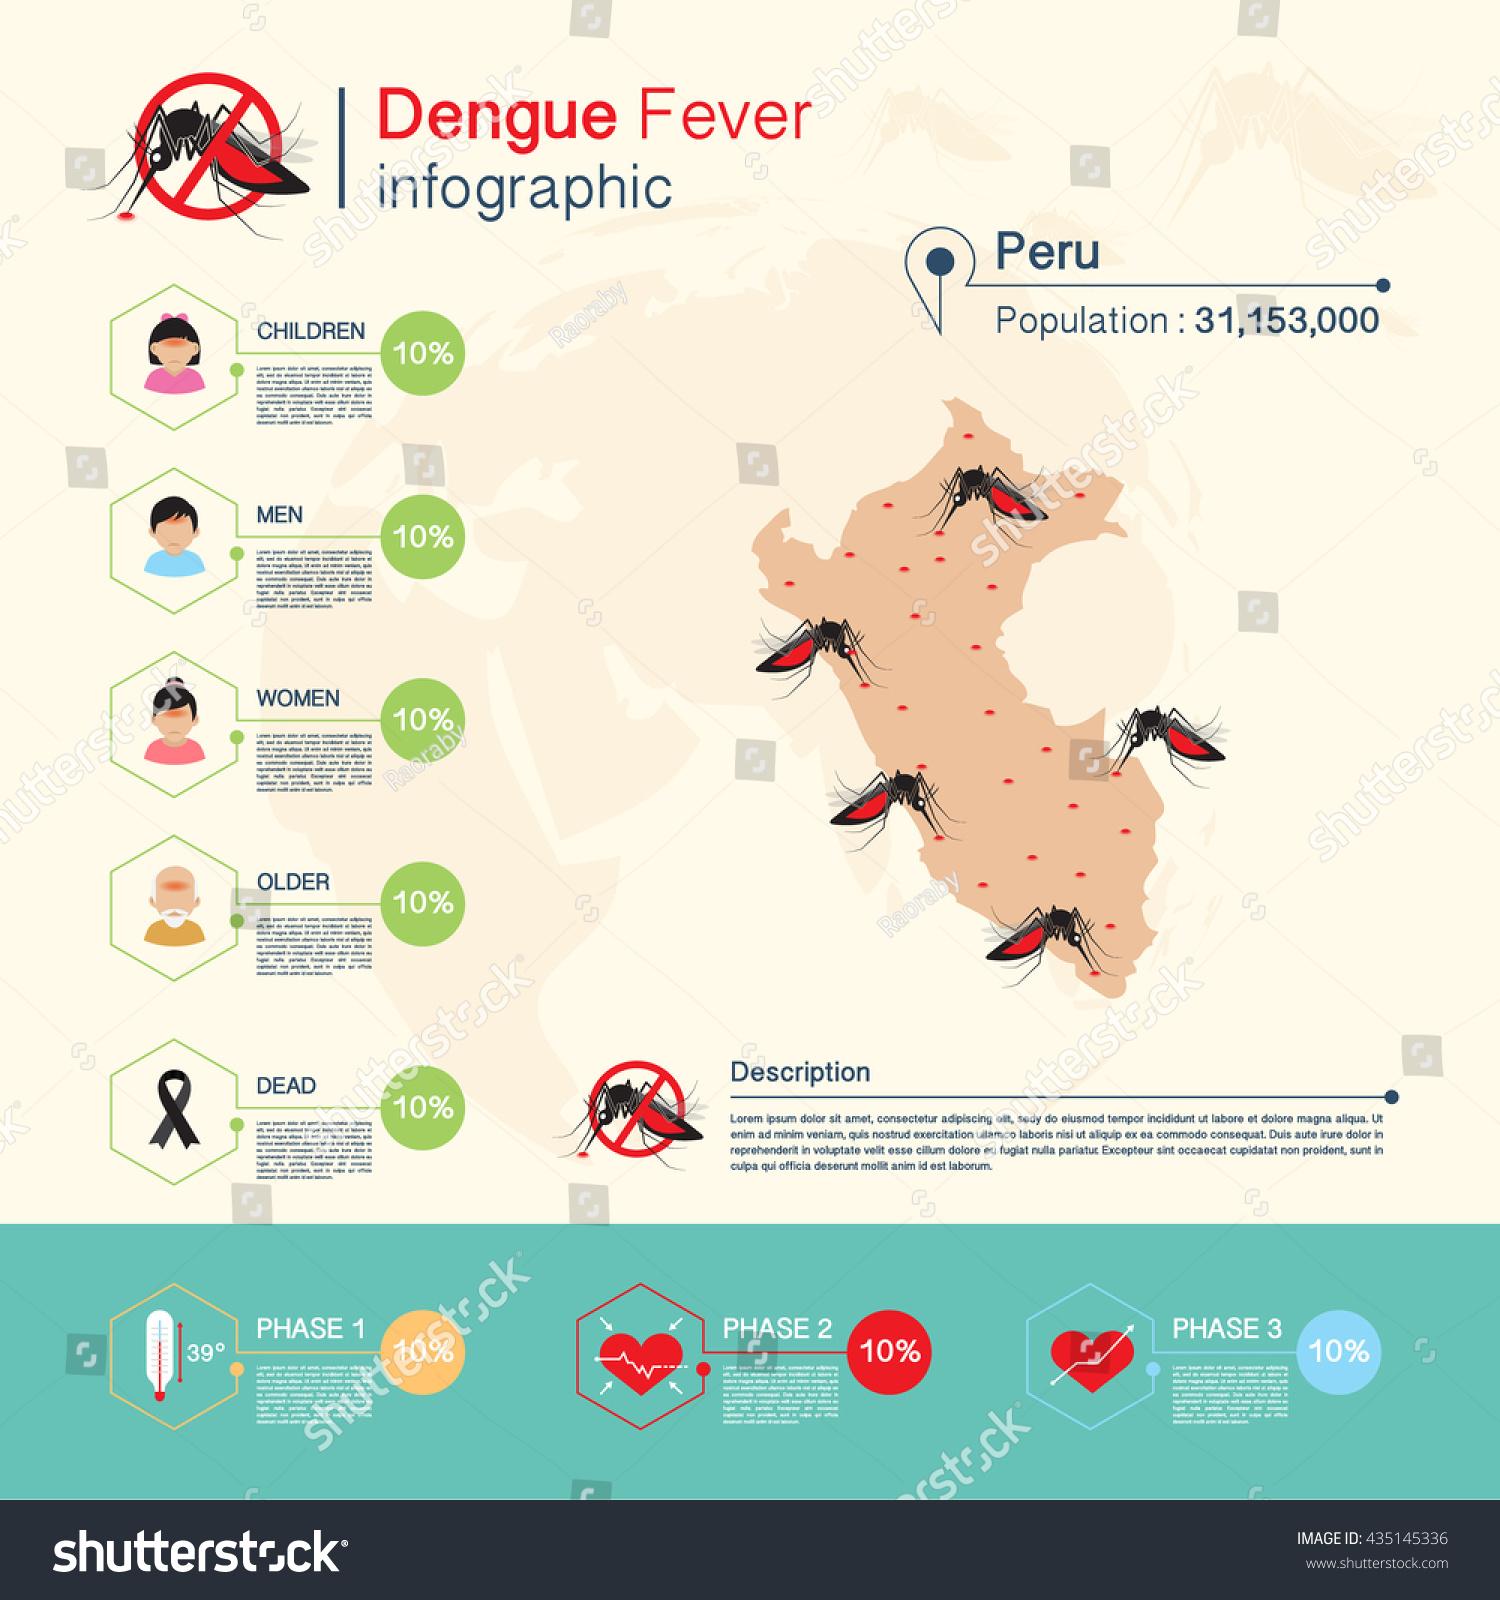 Dengue Fever Zika Virus Malaria Infographic Peru Map Stock Vector